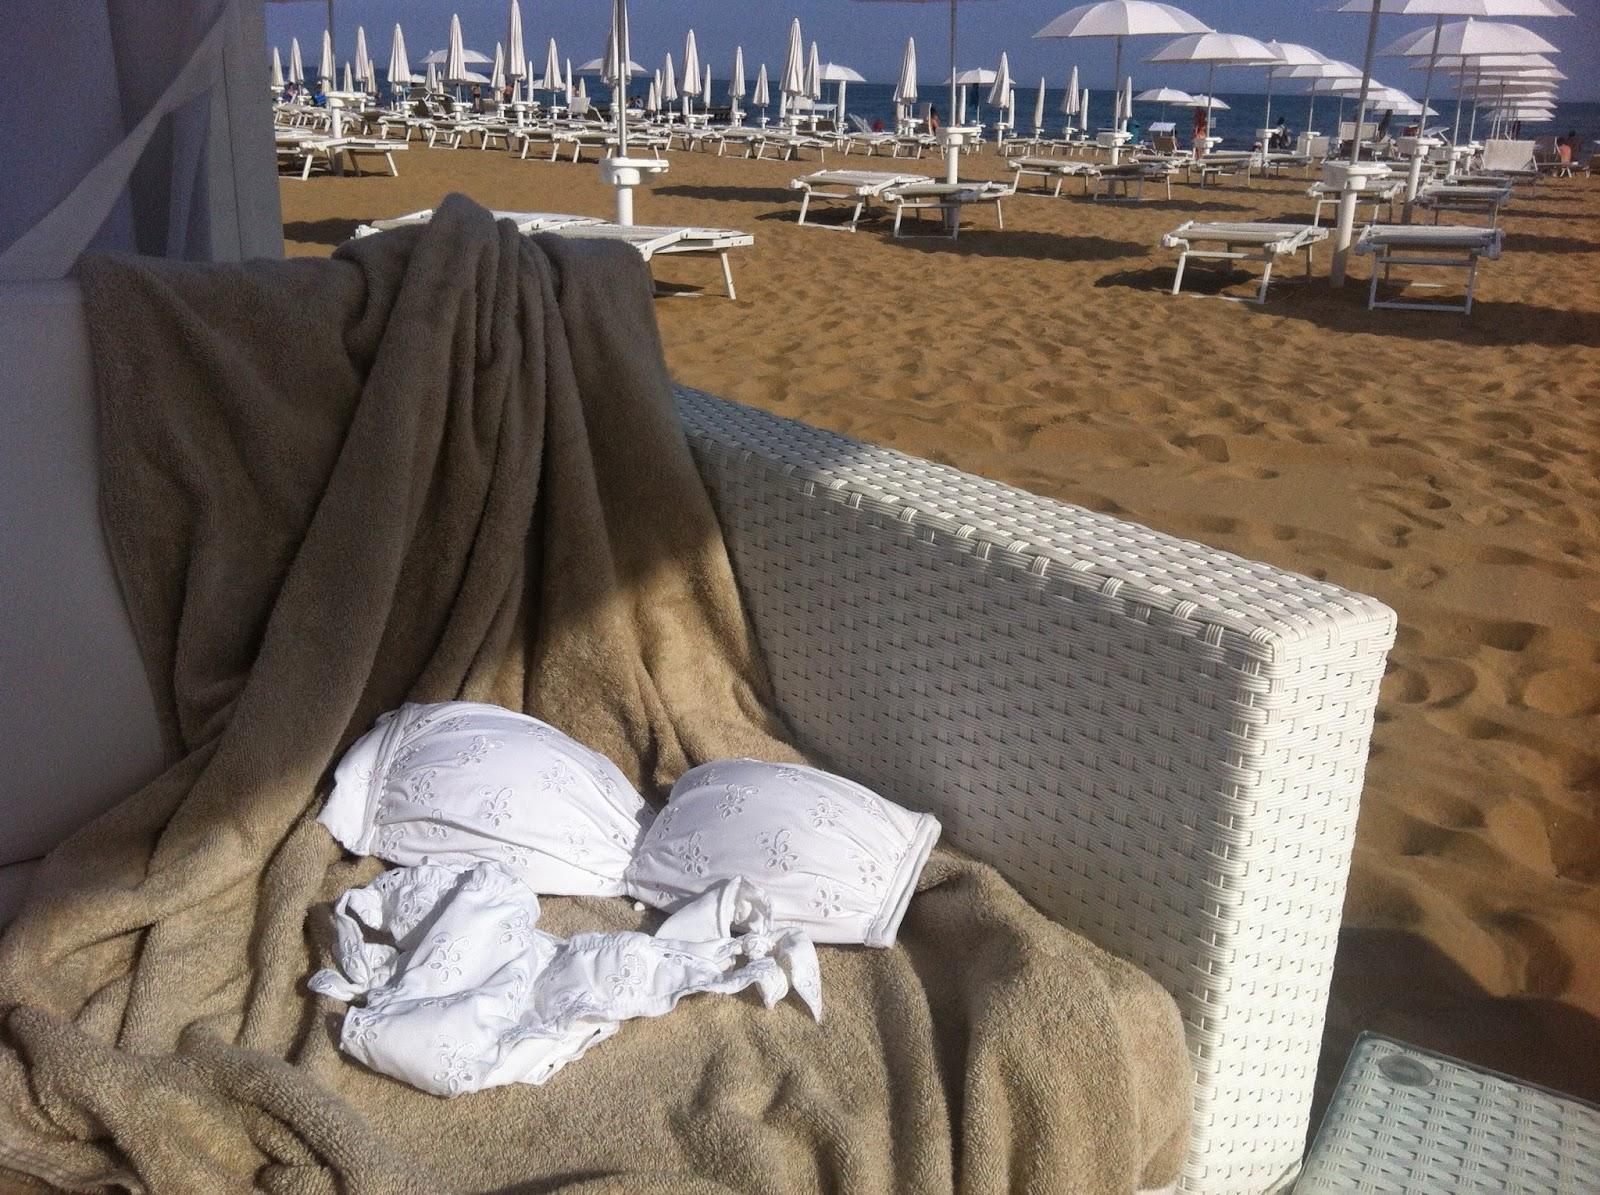 Bikini 2014, costumi Goldenpoint, Philippe Matignon, SiSi, Golden Lady, costumi estate 2014